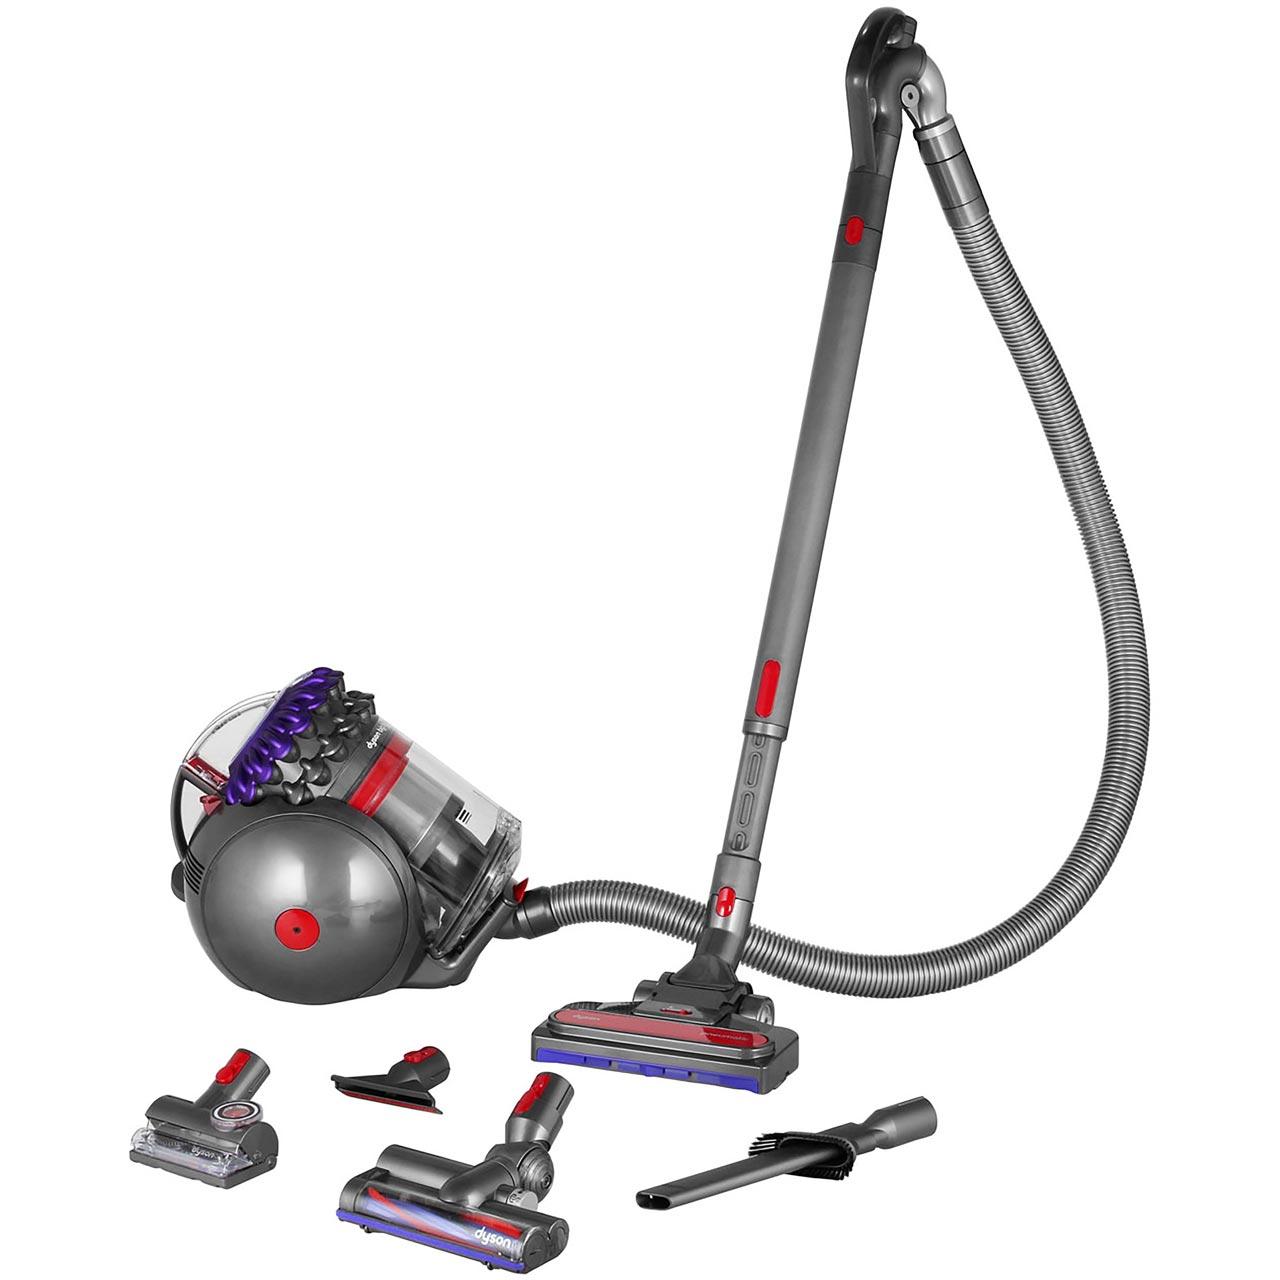 Dyson Big Ball Animal 2 Cylinder Vacuum Cleaner Bagless 5